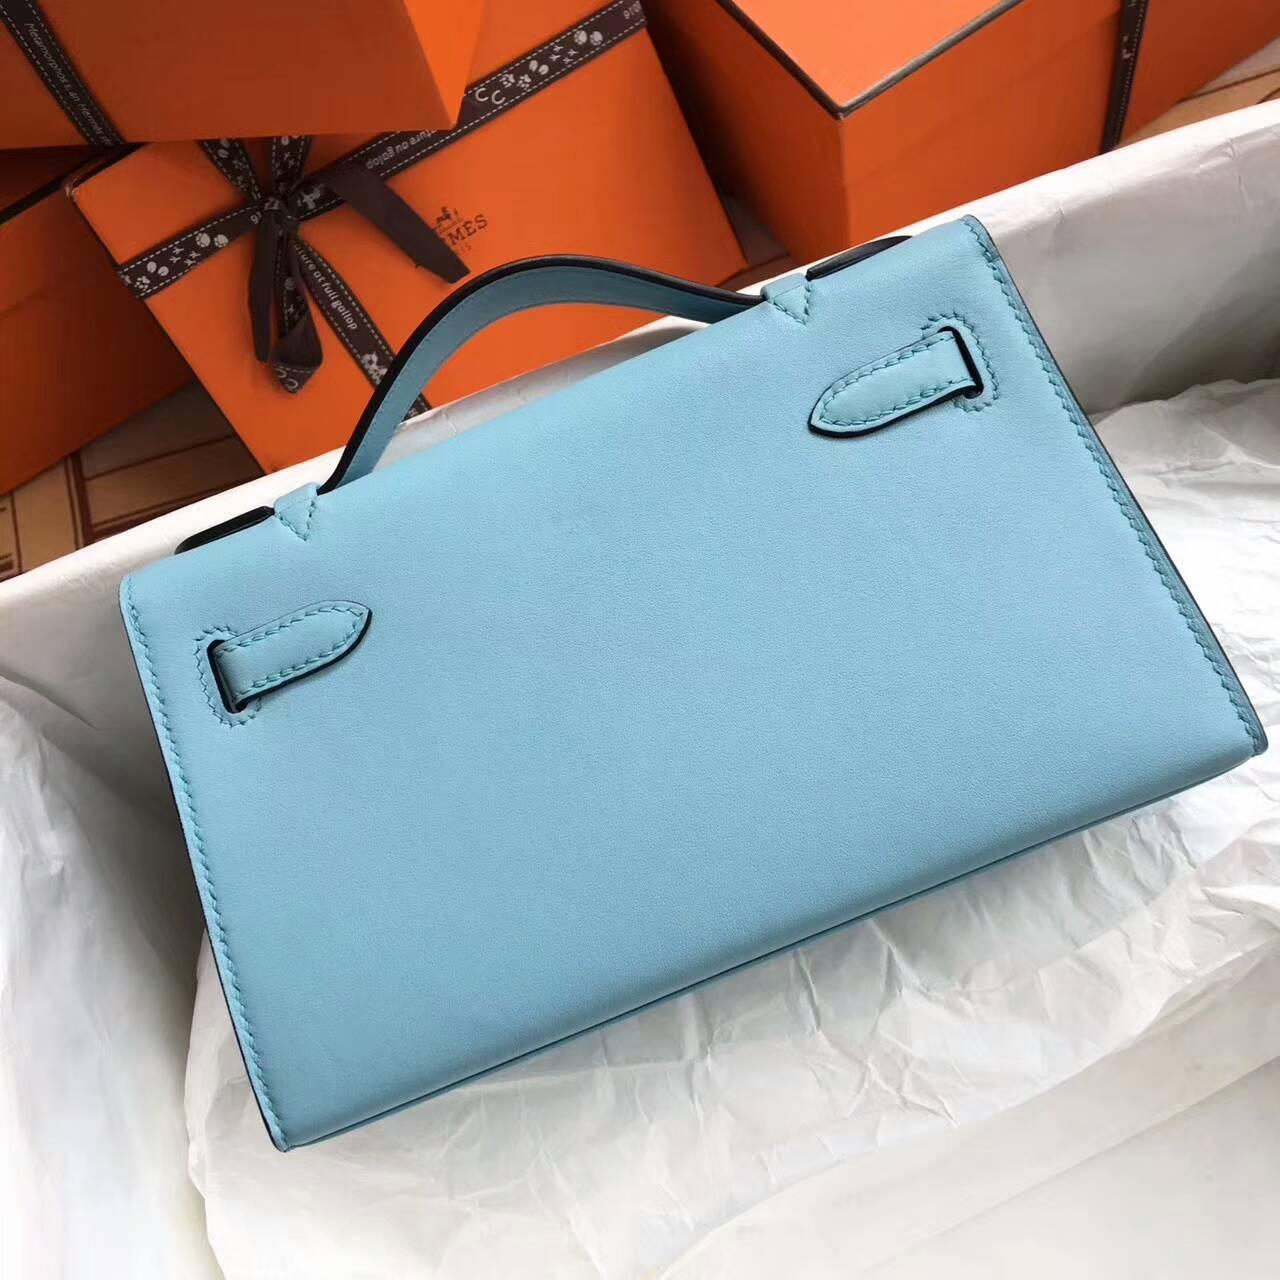 Hermes爱马仕 Mini Kelly pochette 22cm Swift 法国原产平纹小牛皮 3P Blue Atoll 马卡龙蓝 银扣